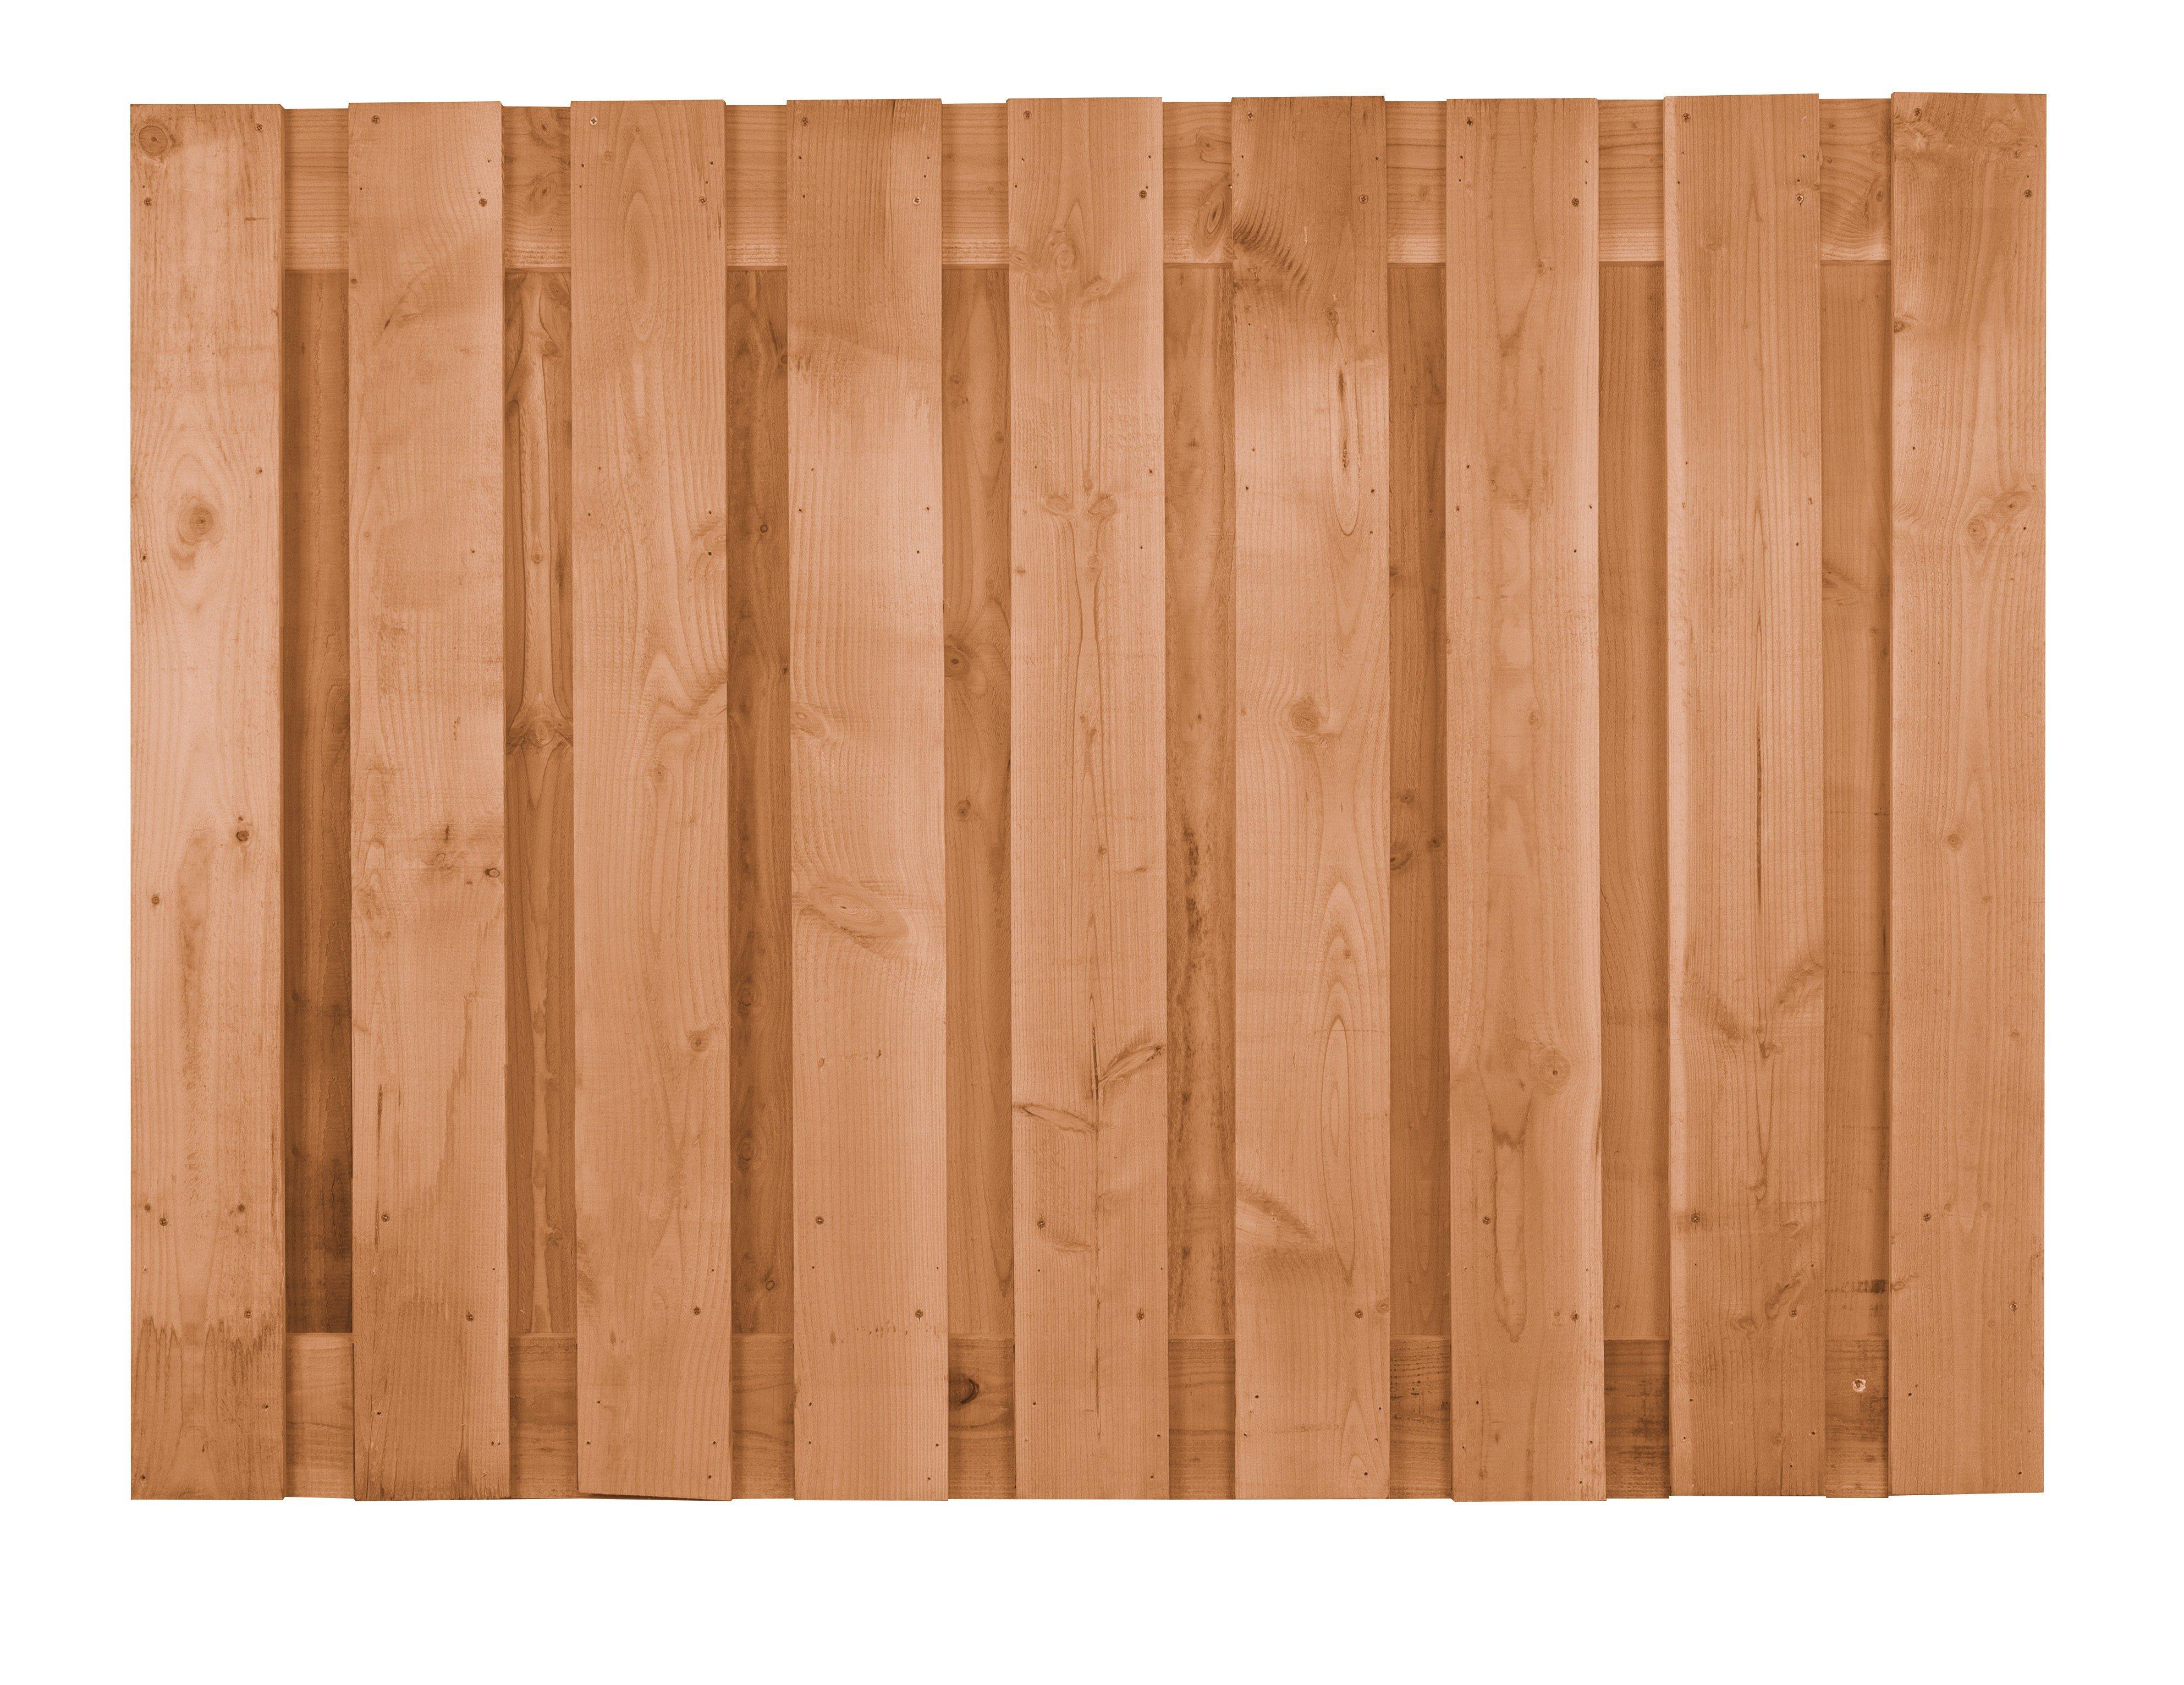 Houten Schutting Douglas lariks 130 x 180 cm. Type: Betonbouw ongeschaafd